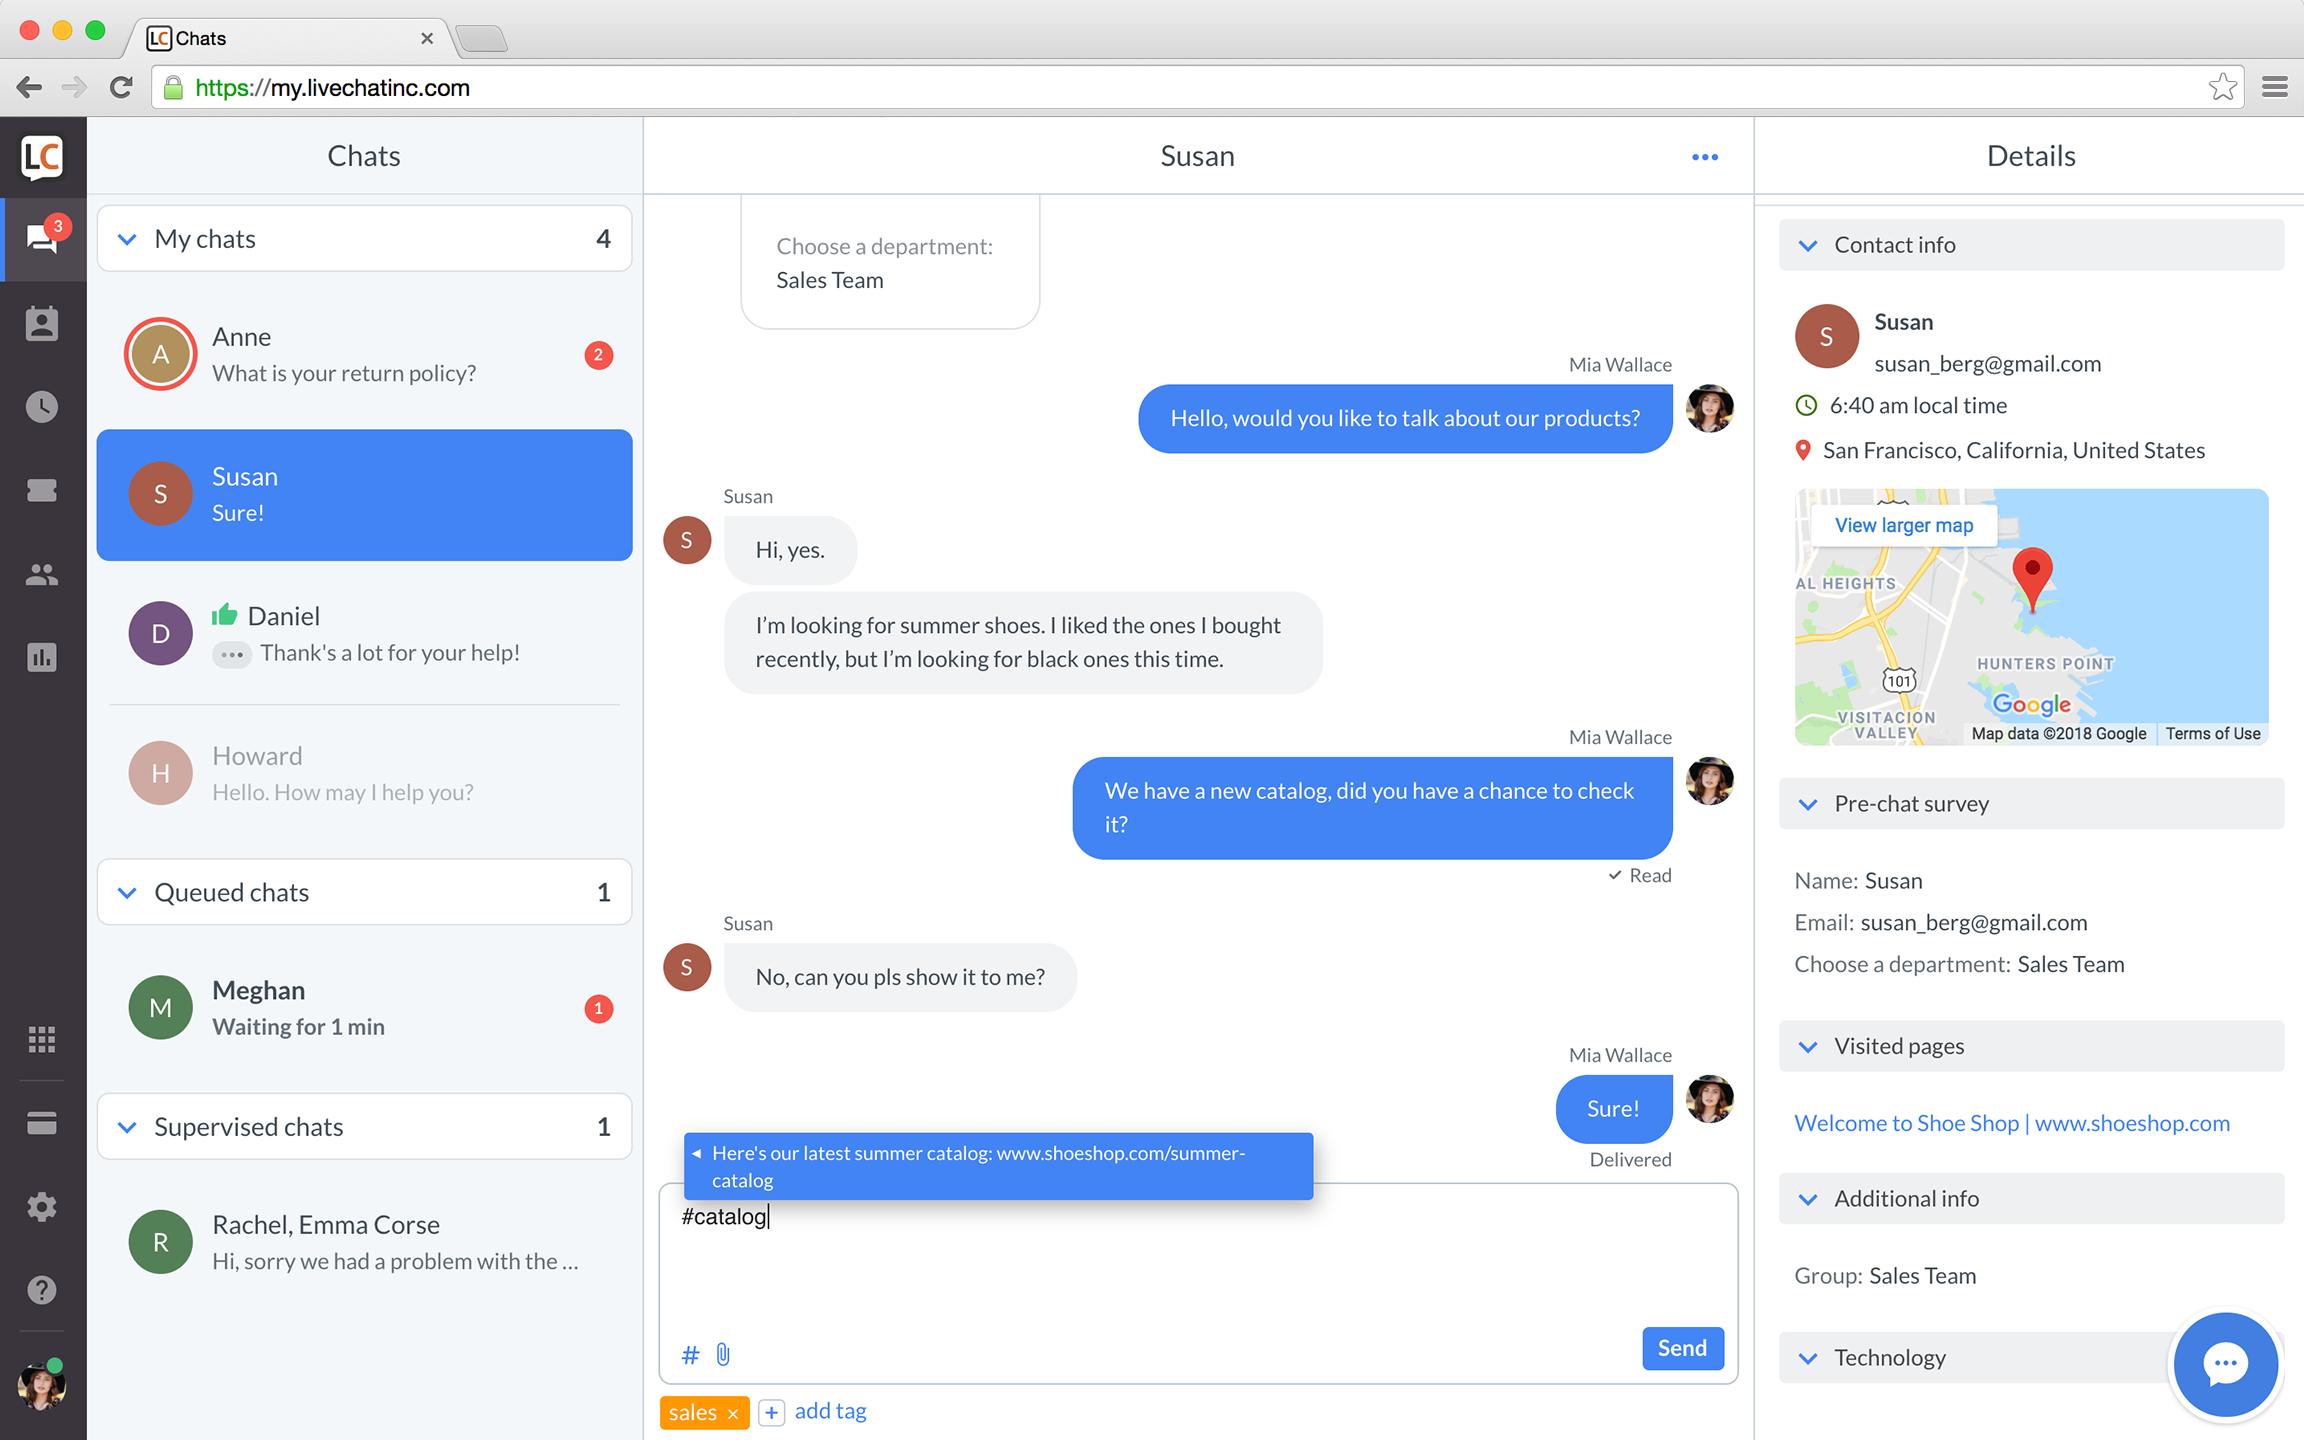 Sneak peek of LiveChat's new platform